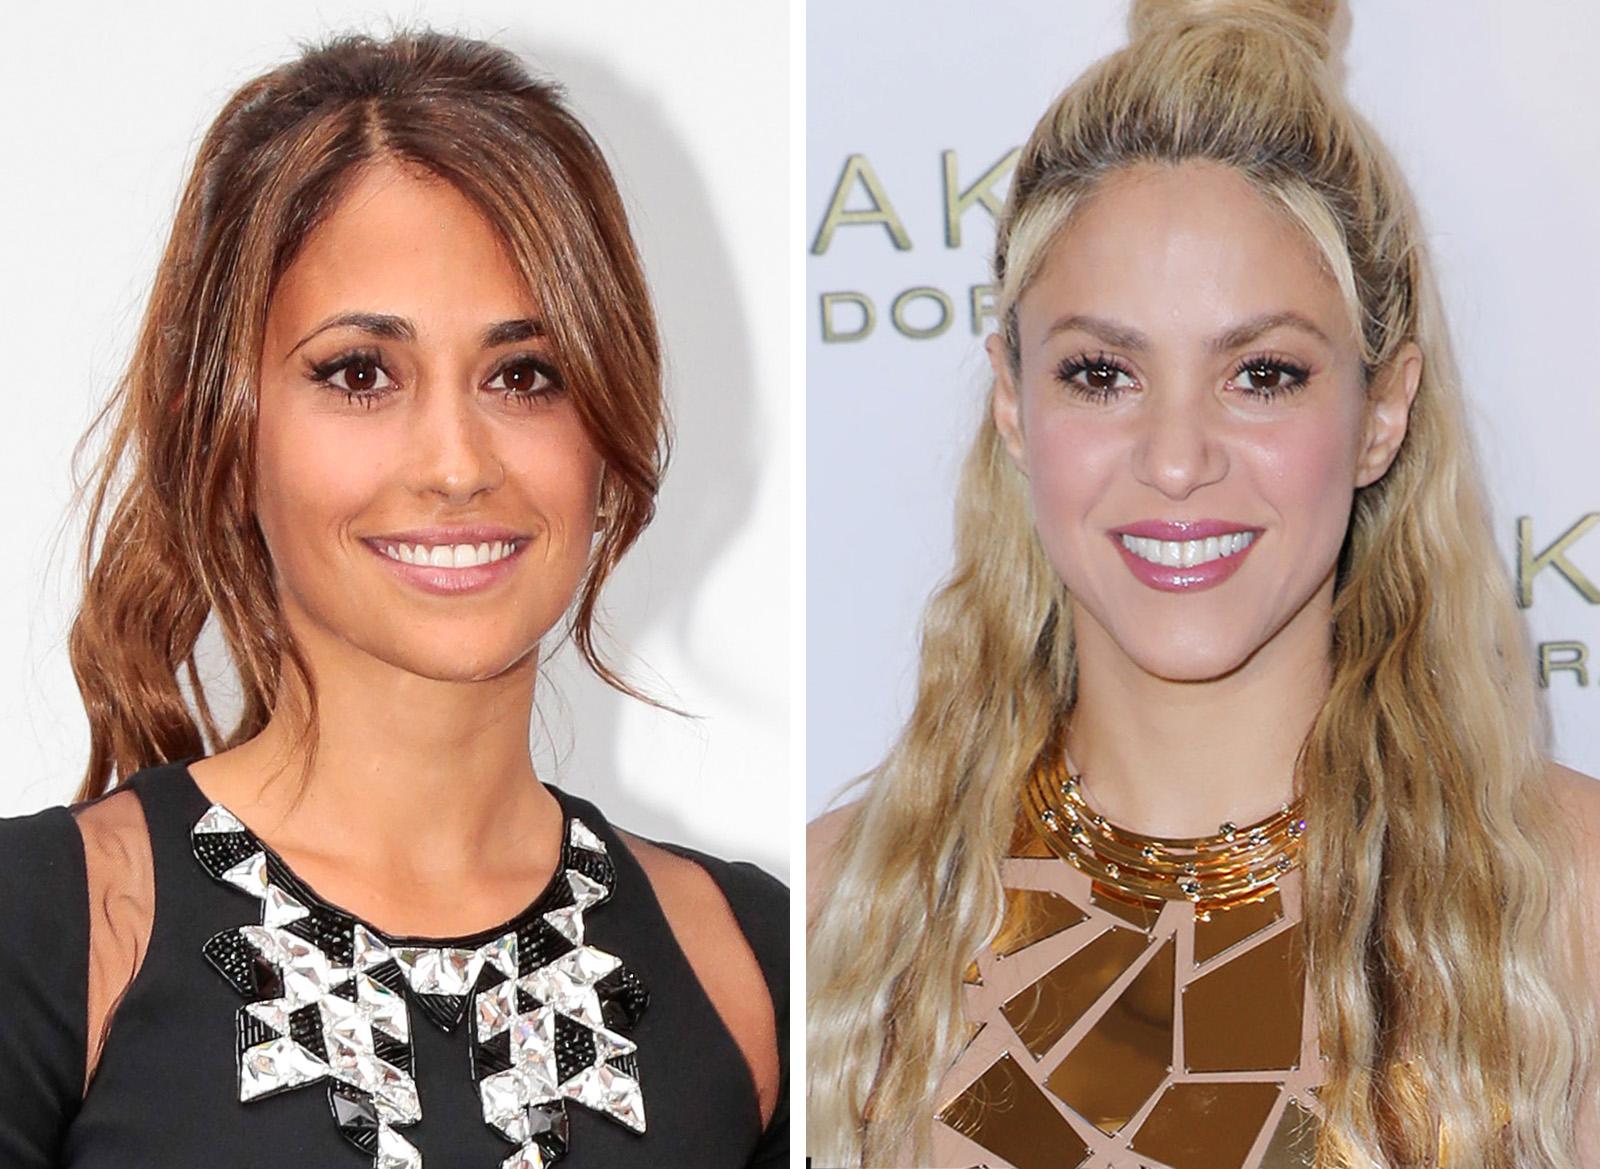 Antonella Roccuzzo y Shakira